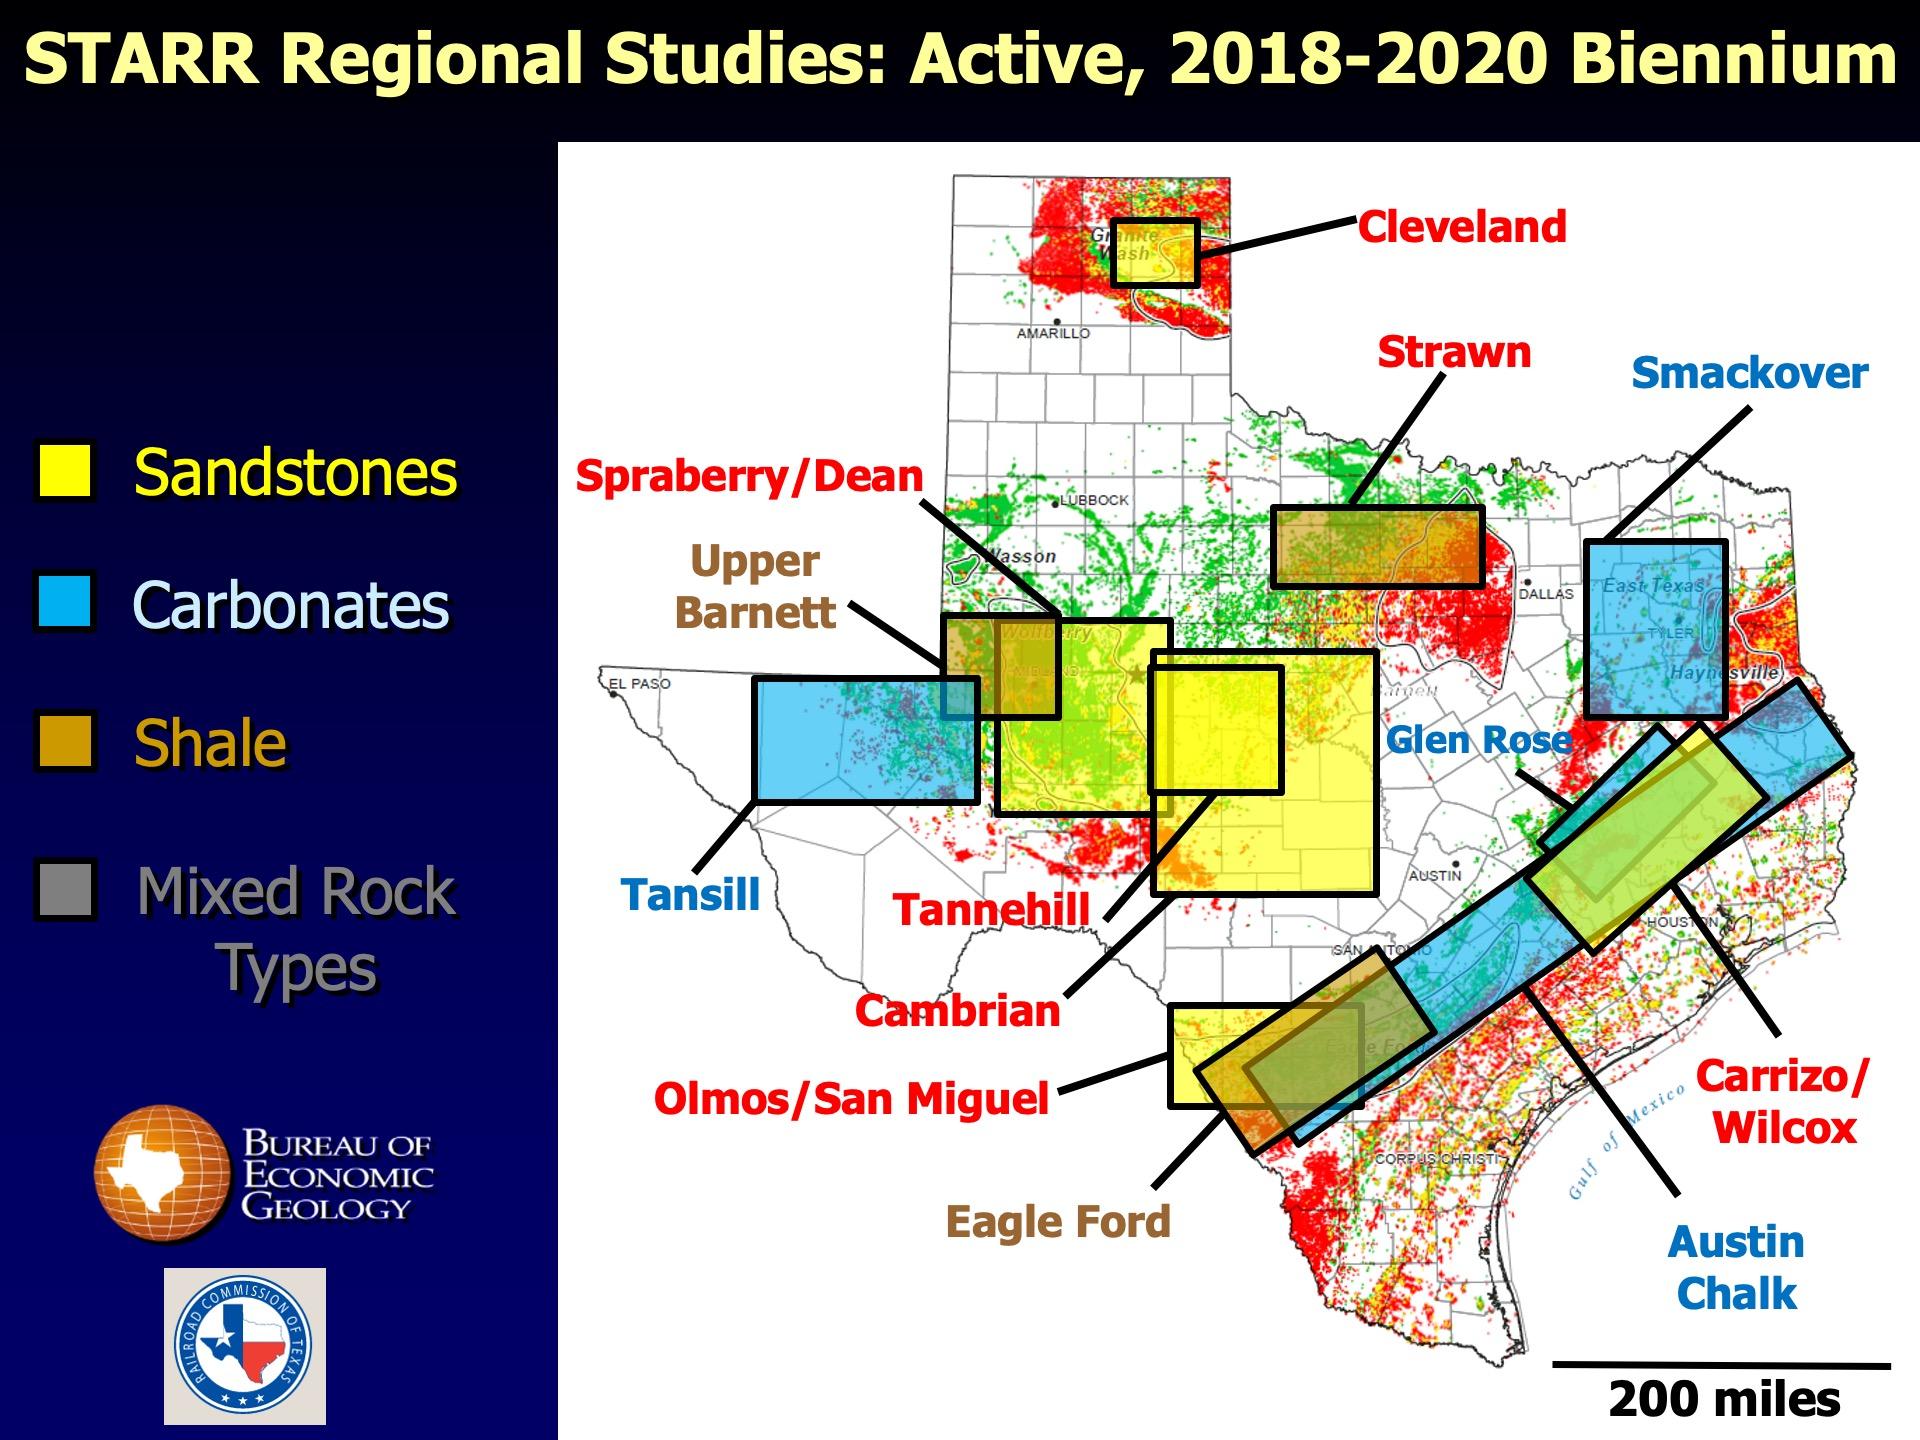 STARR Regional Studies